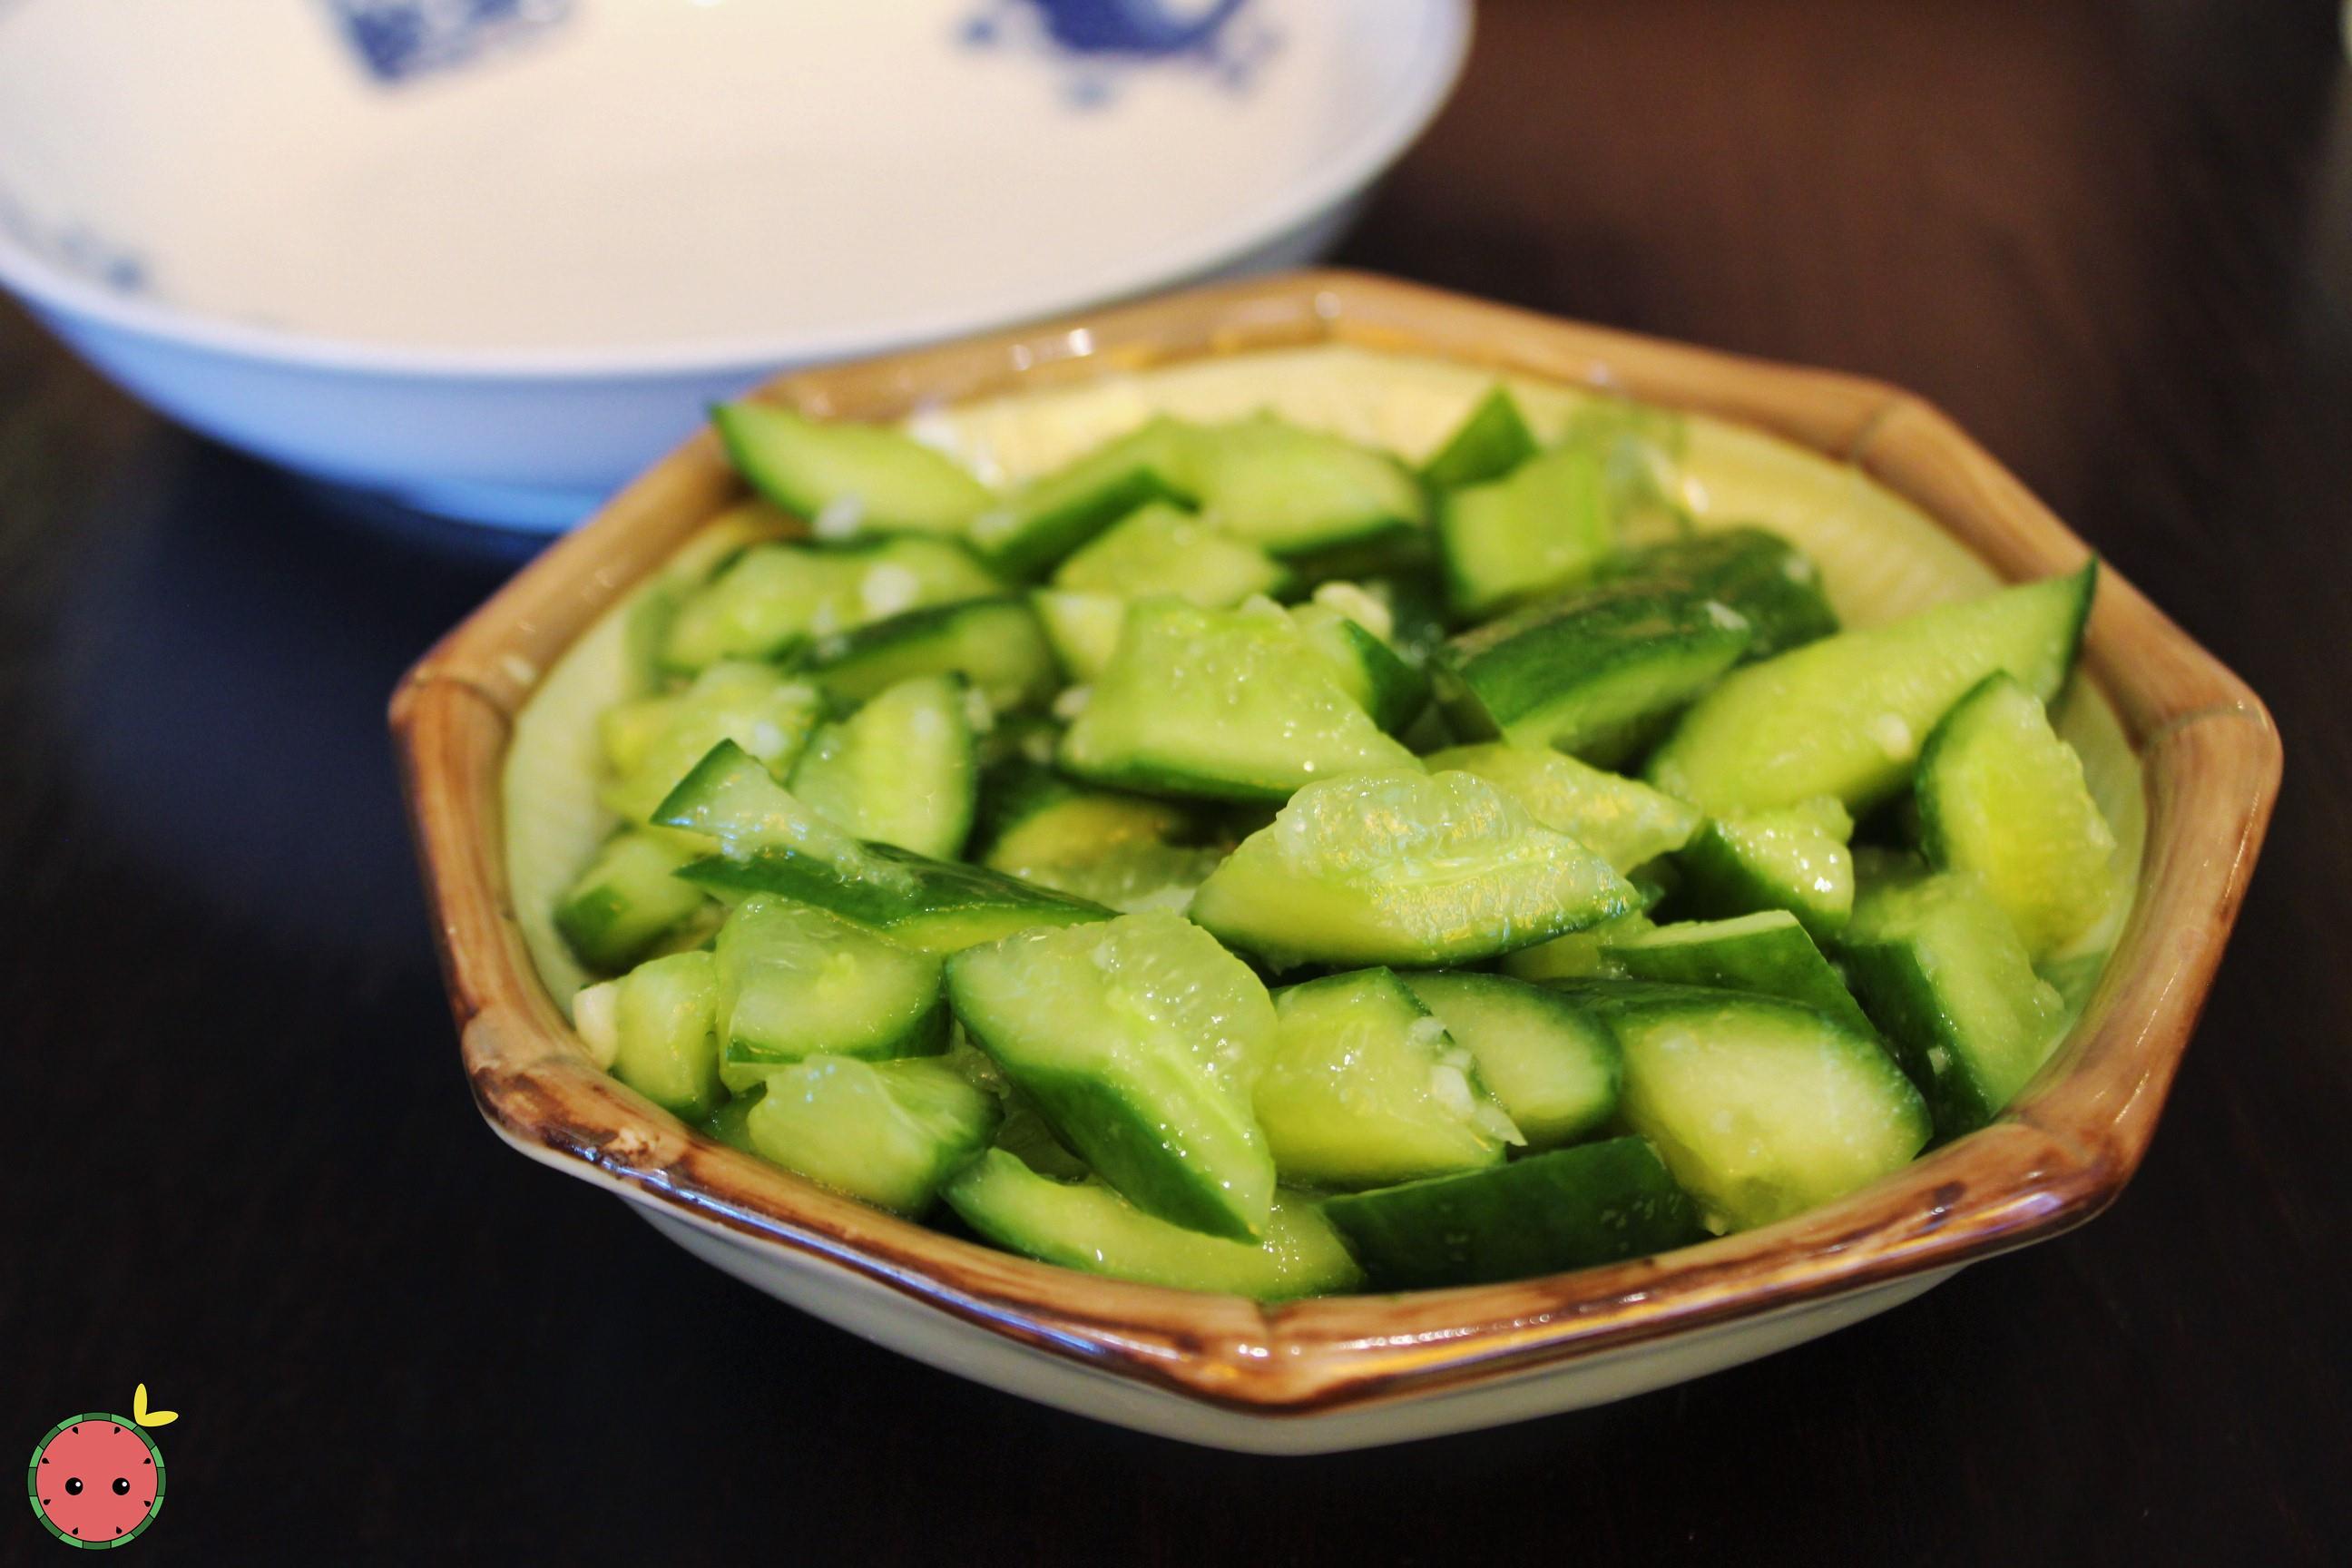 Baby Cucumber - Young cucumber in garlic sauce